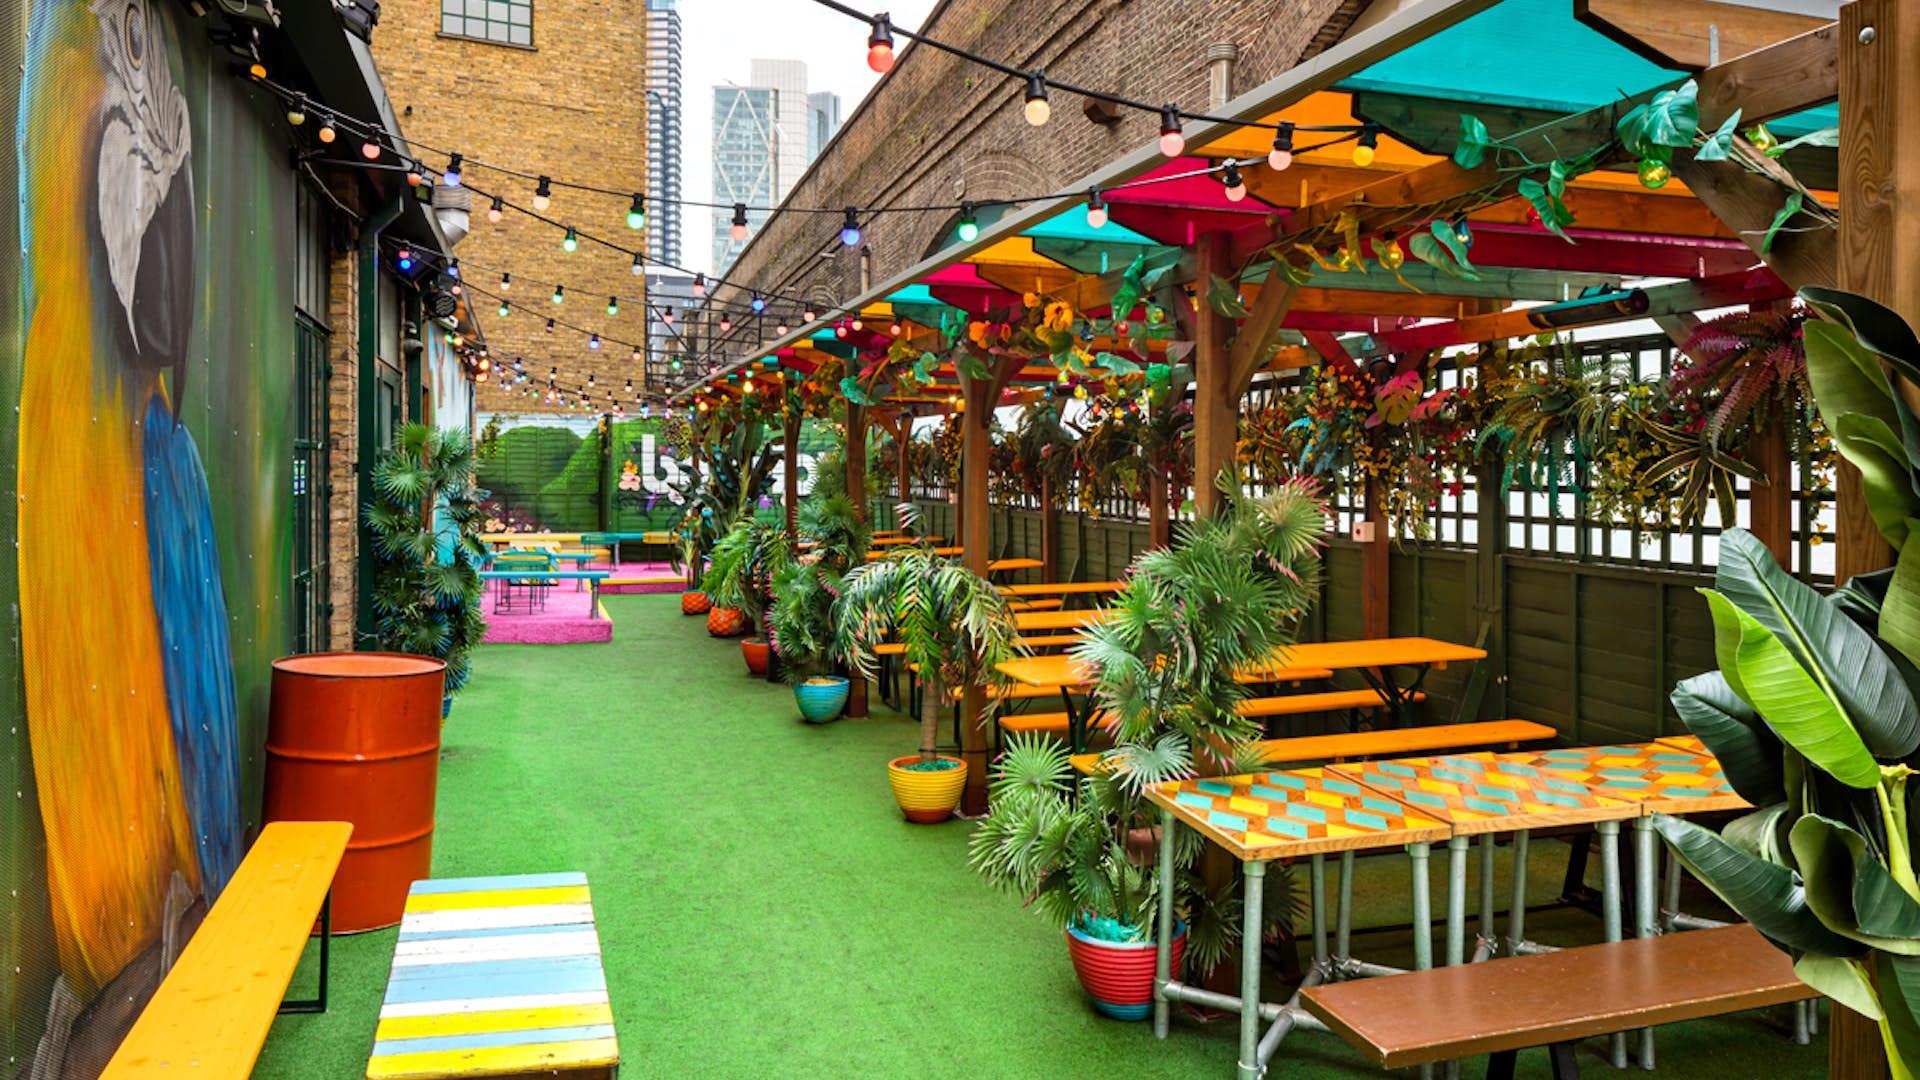 La Terraza Business Hire Barrio East